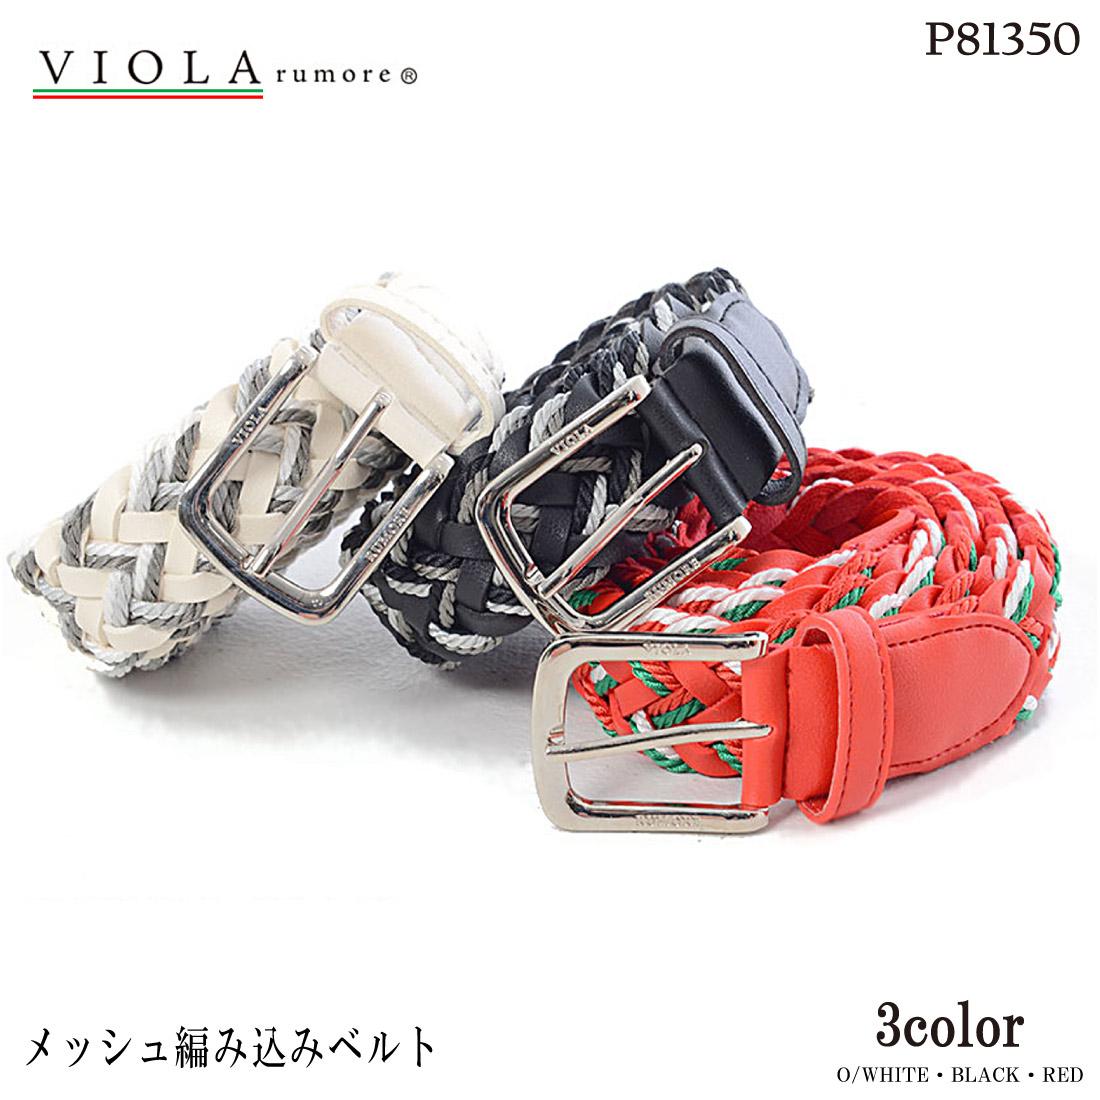 VIOLA rumore ヴィオラ ルモーレ メッシュベルト P81350 フリーサイズ メンズ